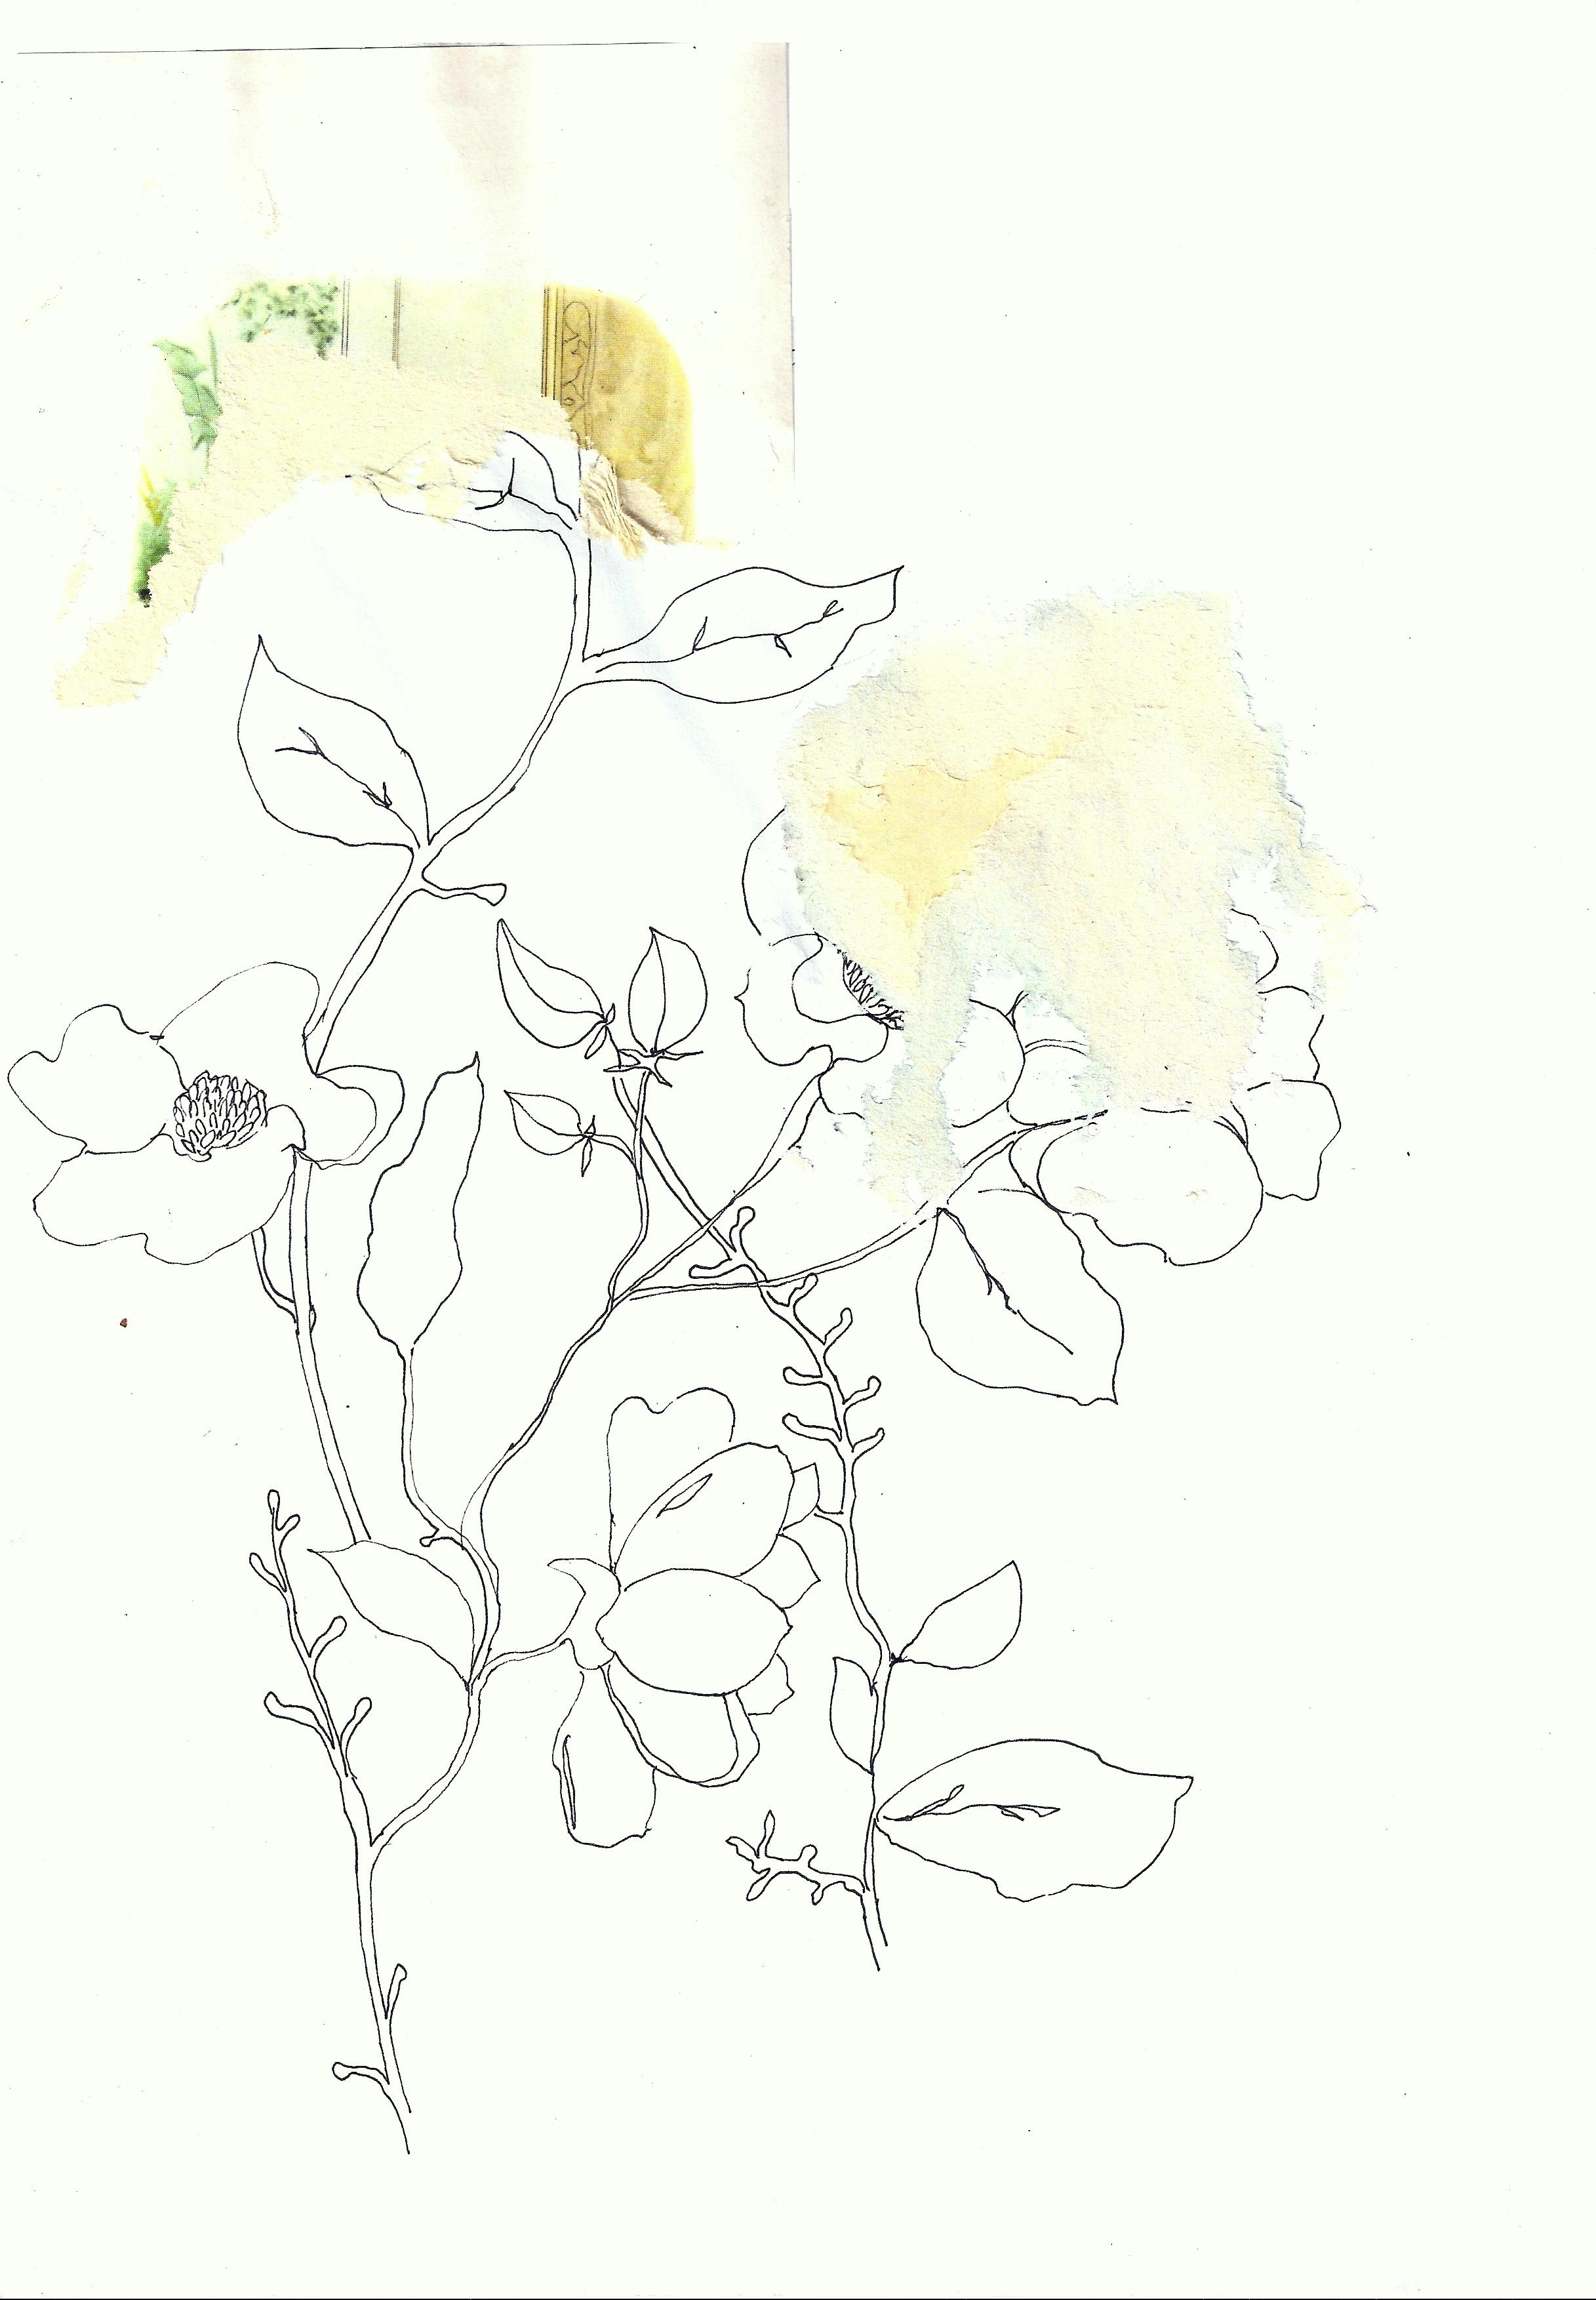 Line Art Flower : Line drawing flower with vintage collage art on the brink